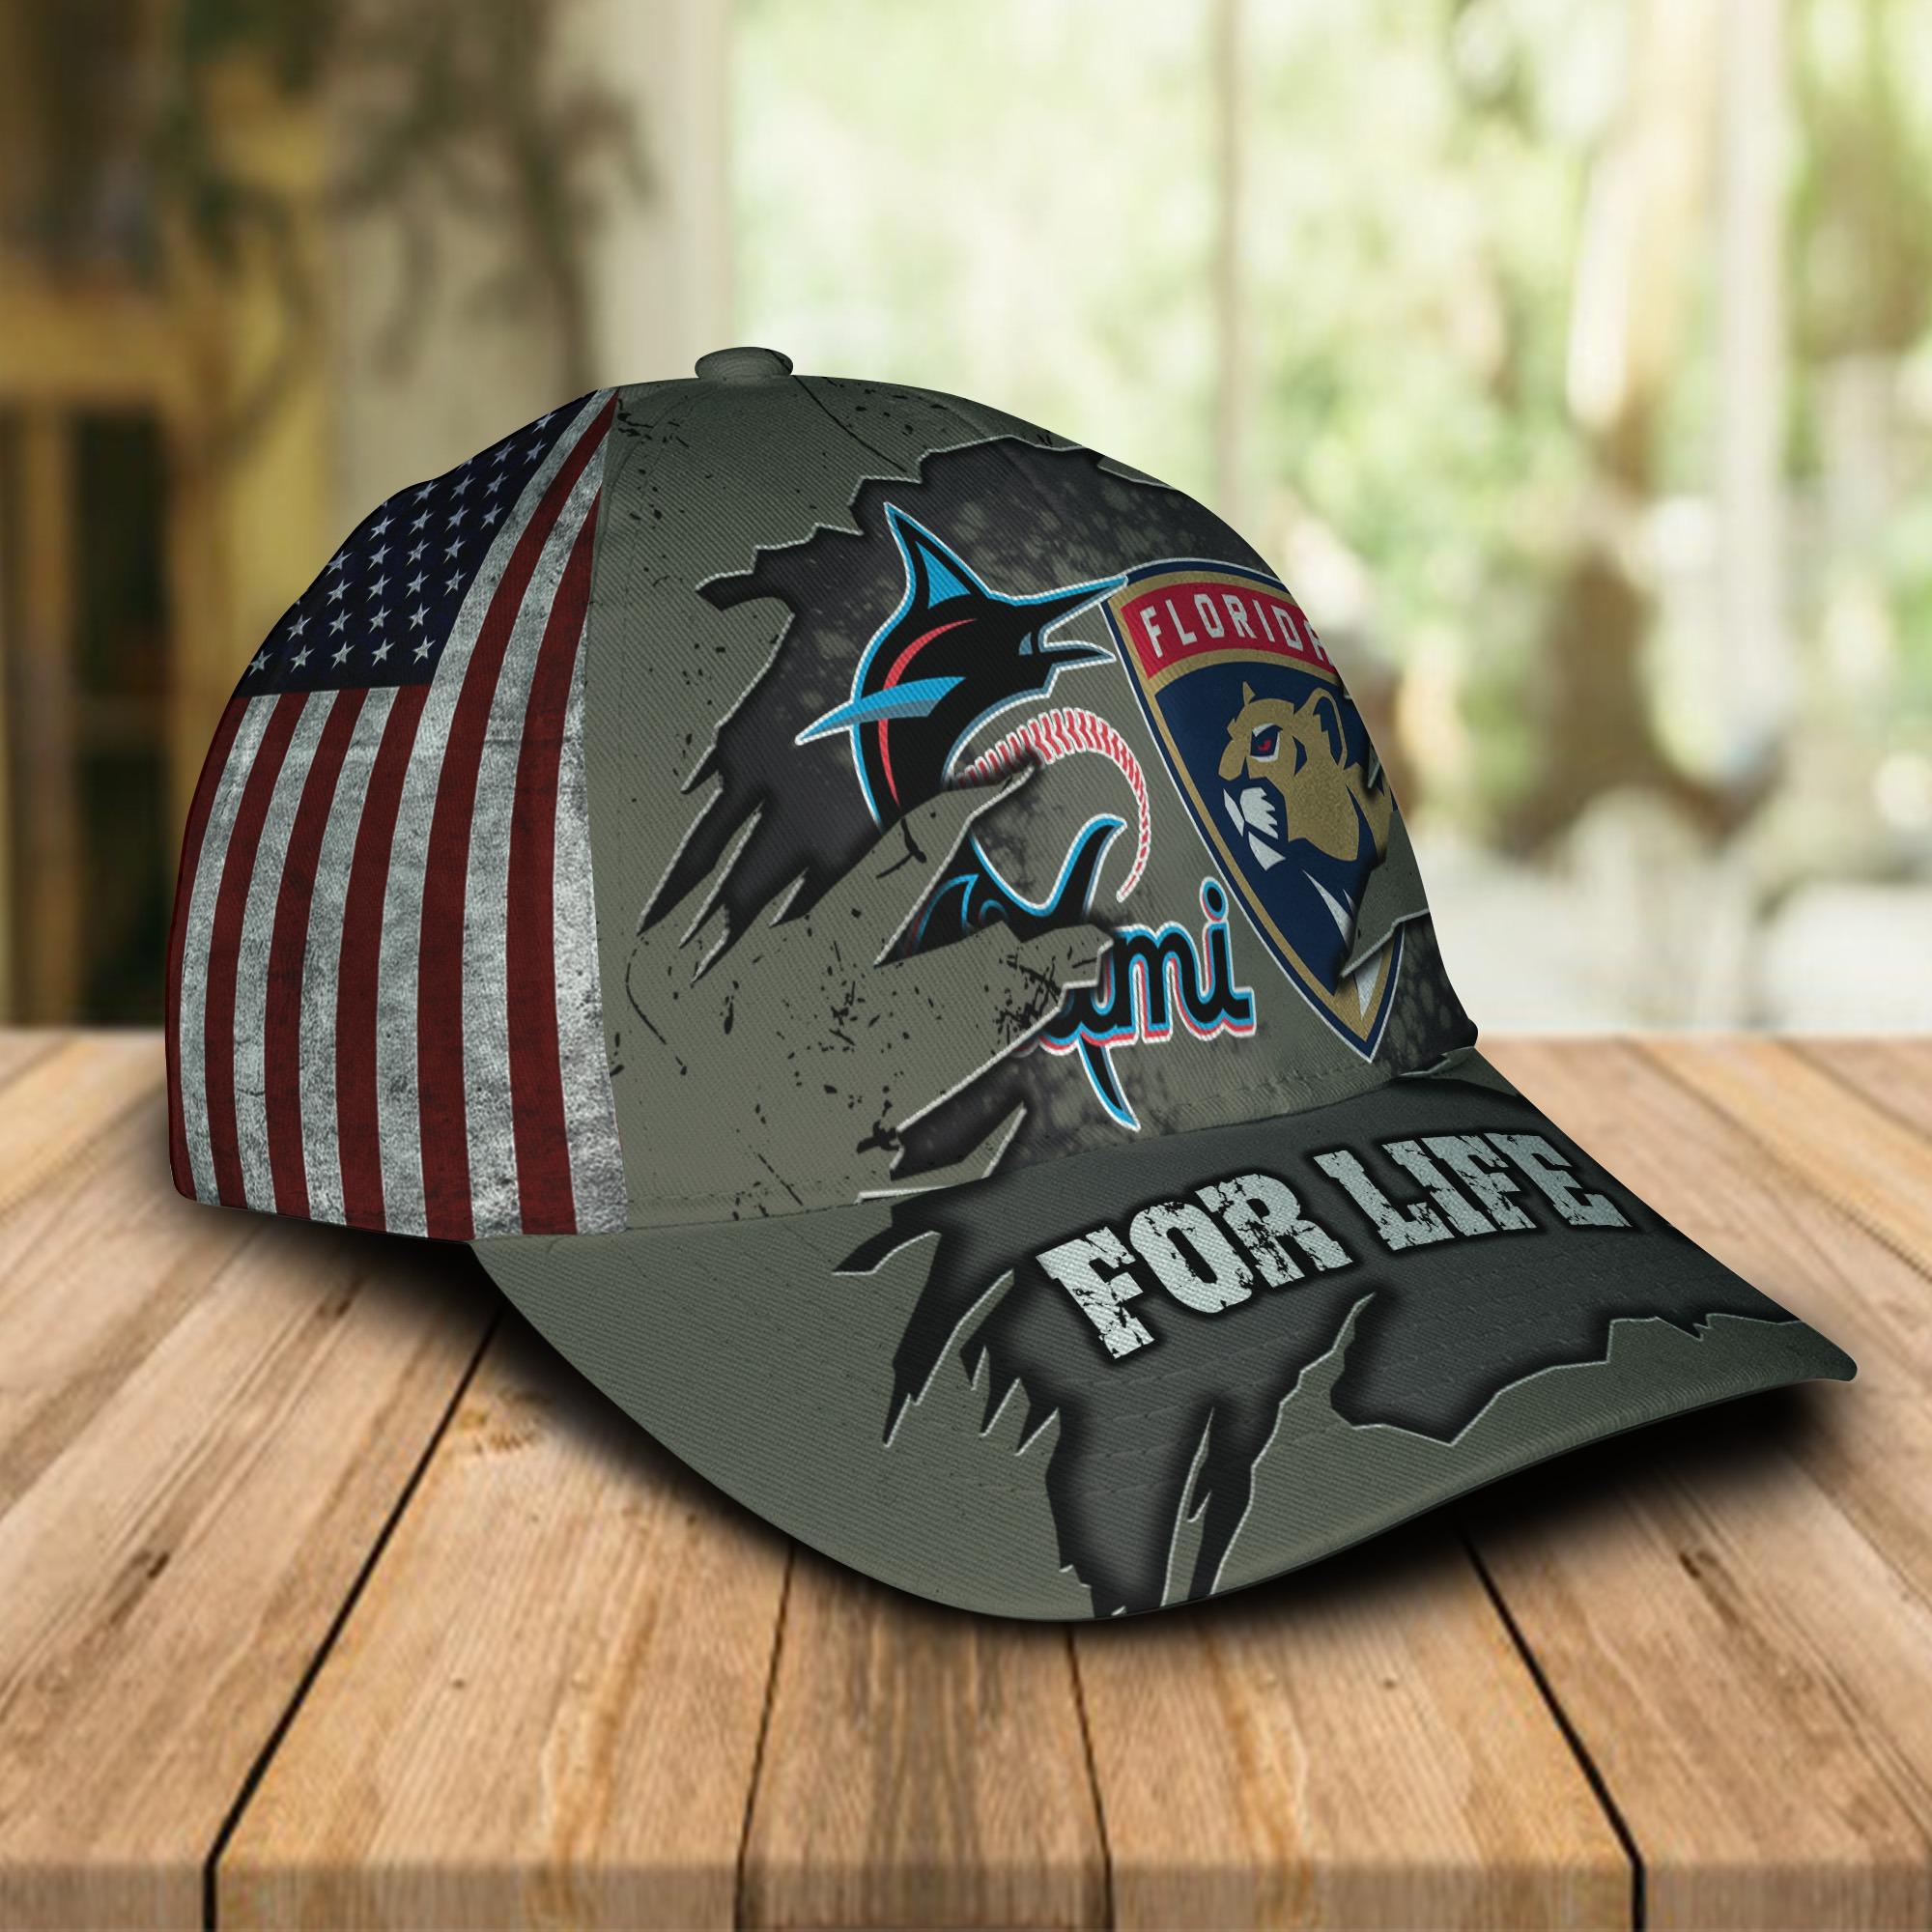 Miami Marlins Florida Panthers For Life Cap 1